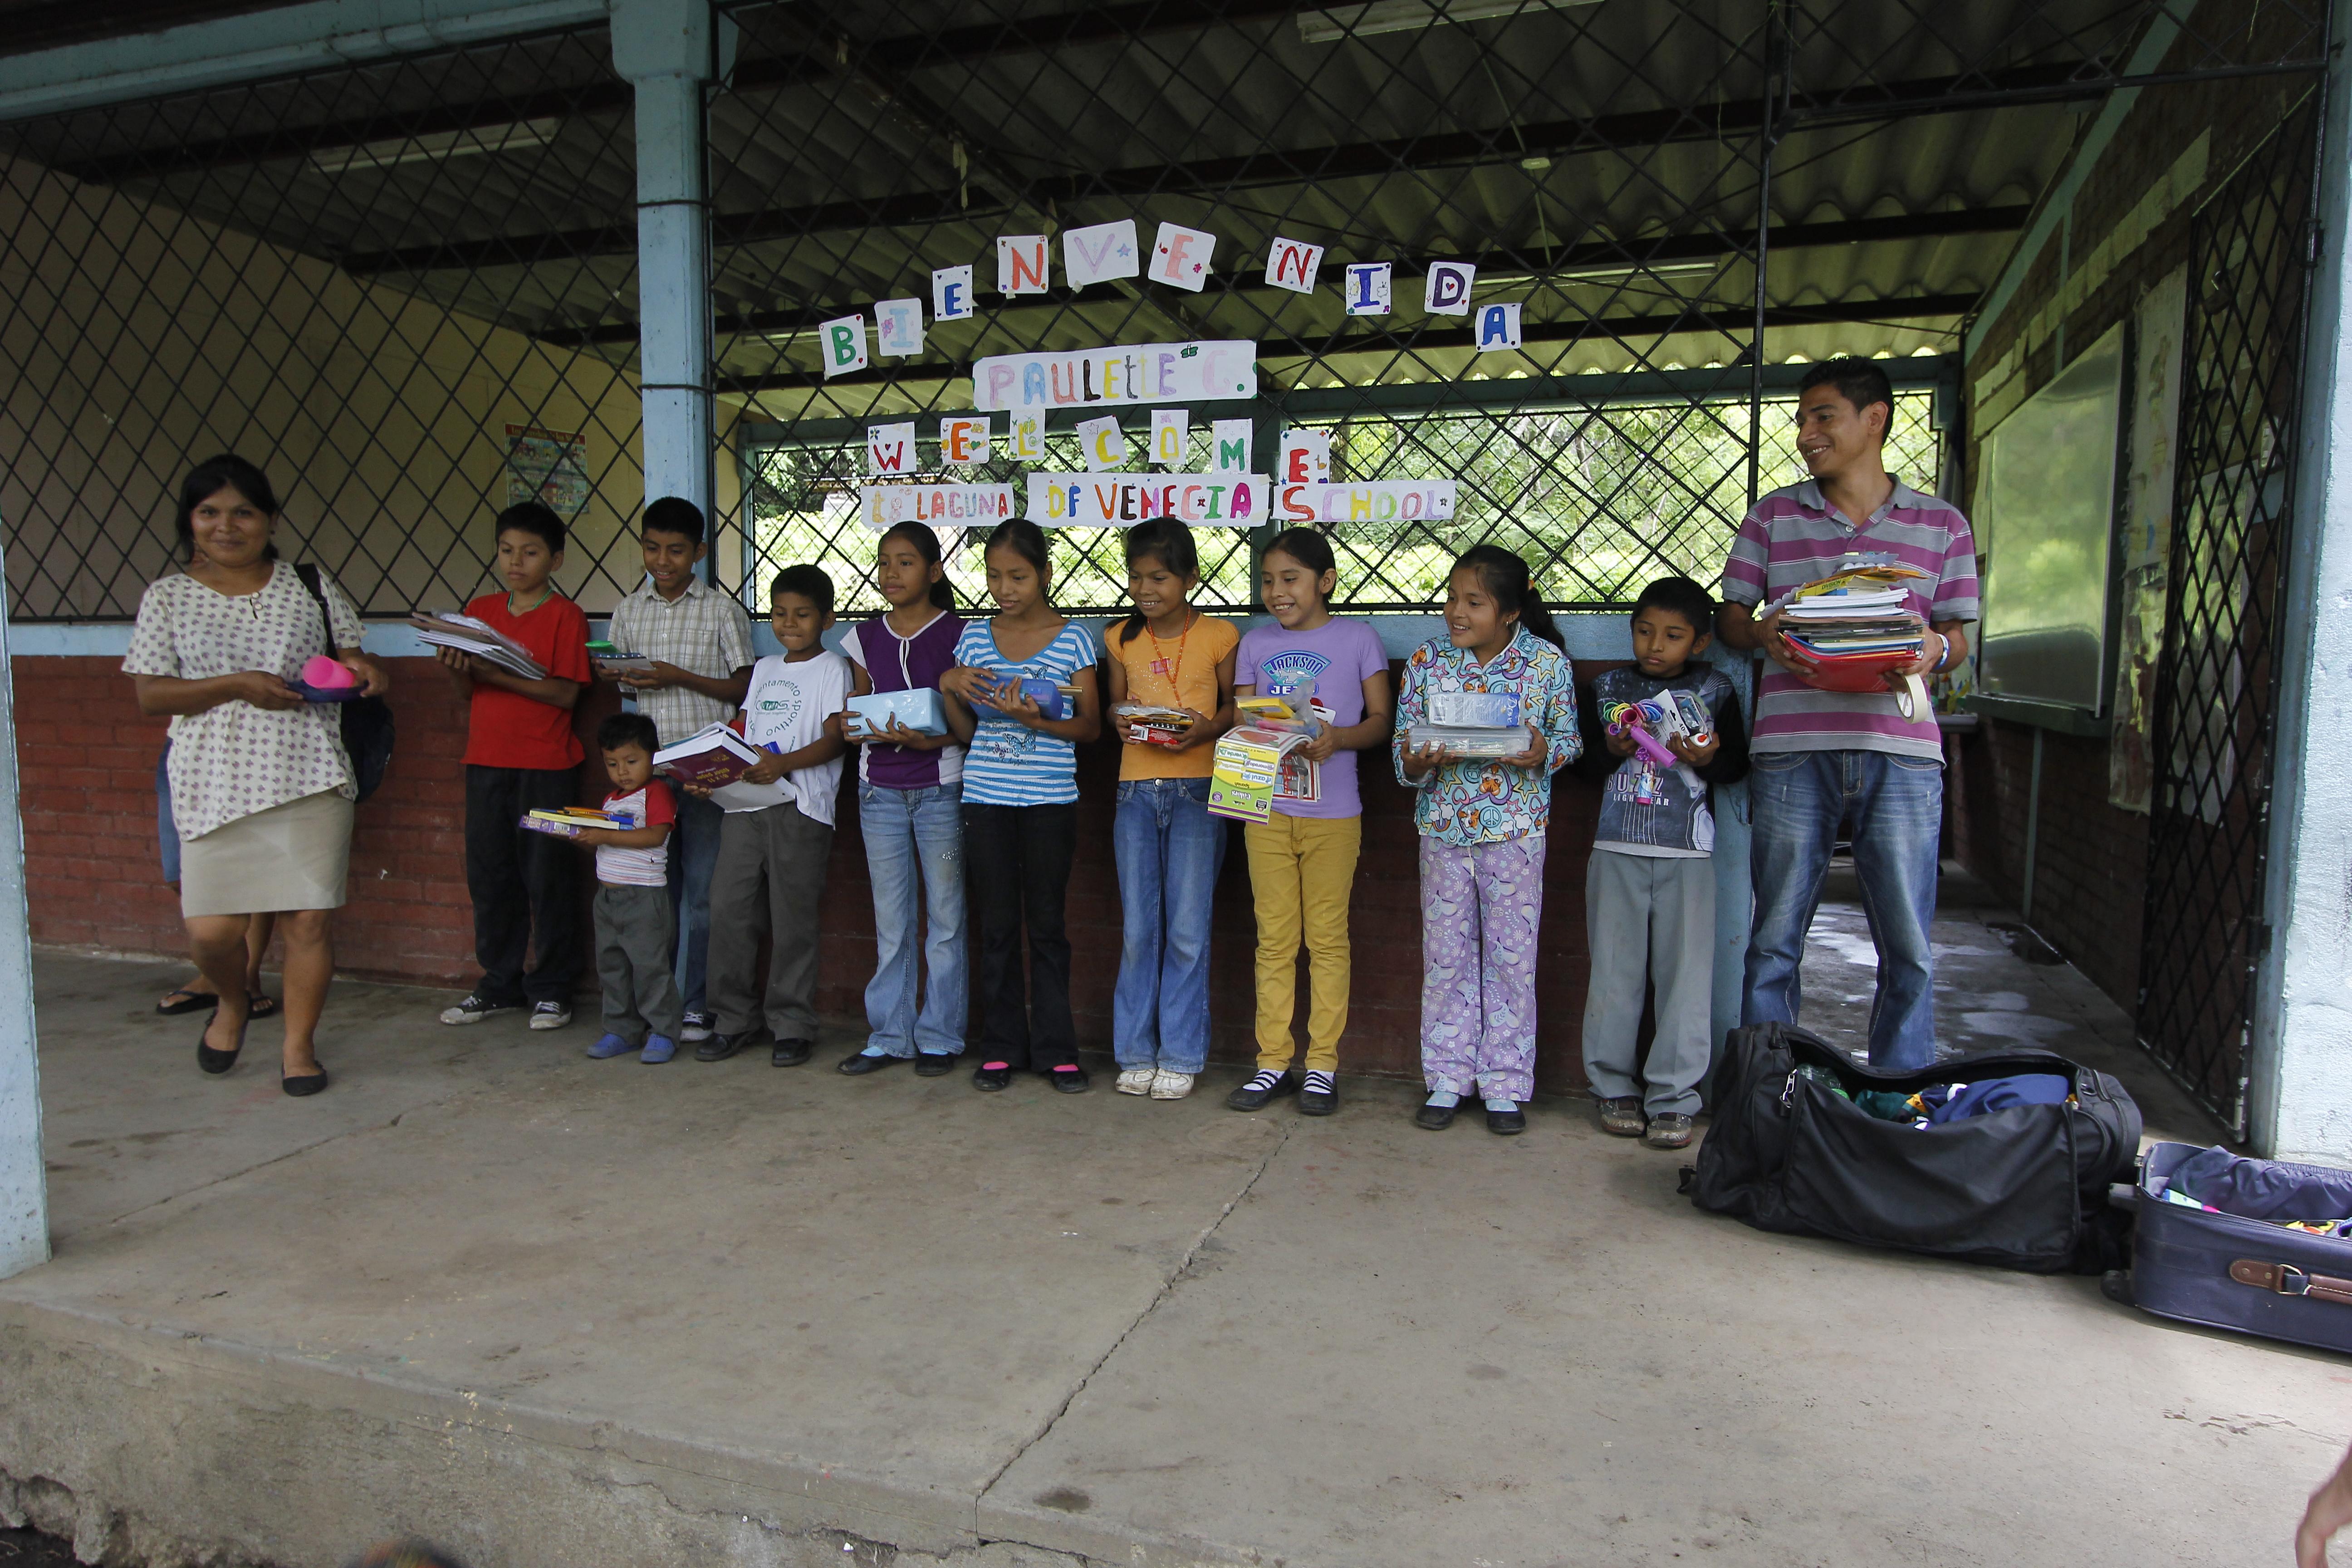 Ecole Nicaragua Projet Responsable La Mariposa